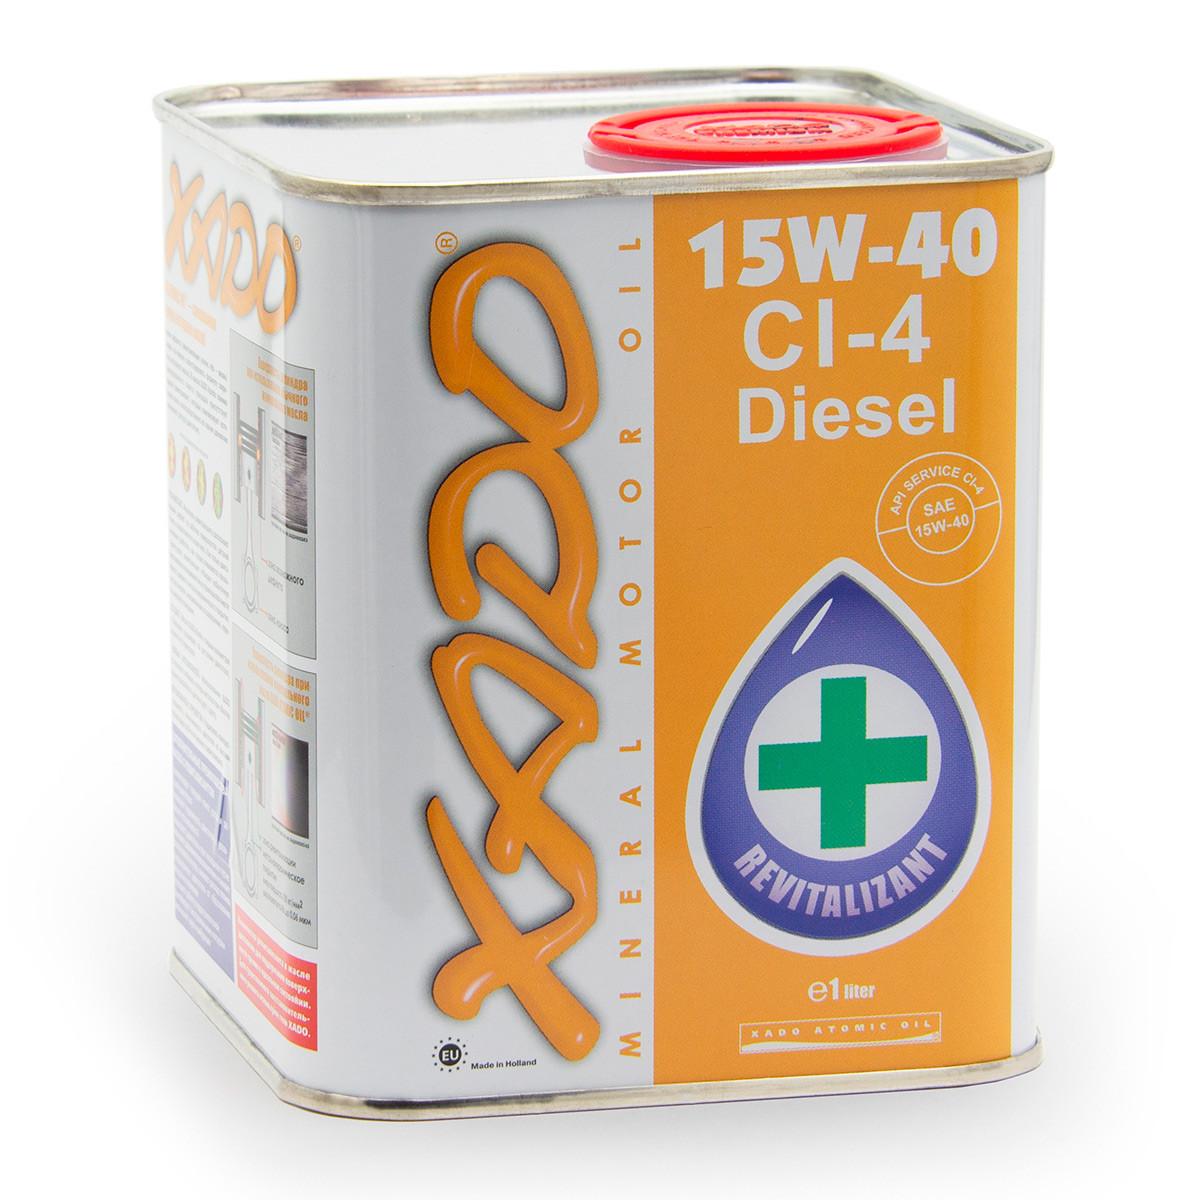 Мінеральне моторне масло XADO Atomic Oil 15W-40 CI-4 Diesel